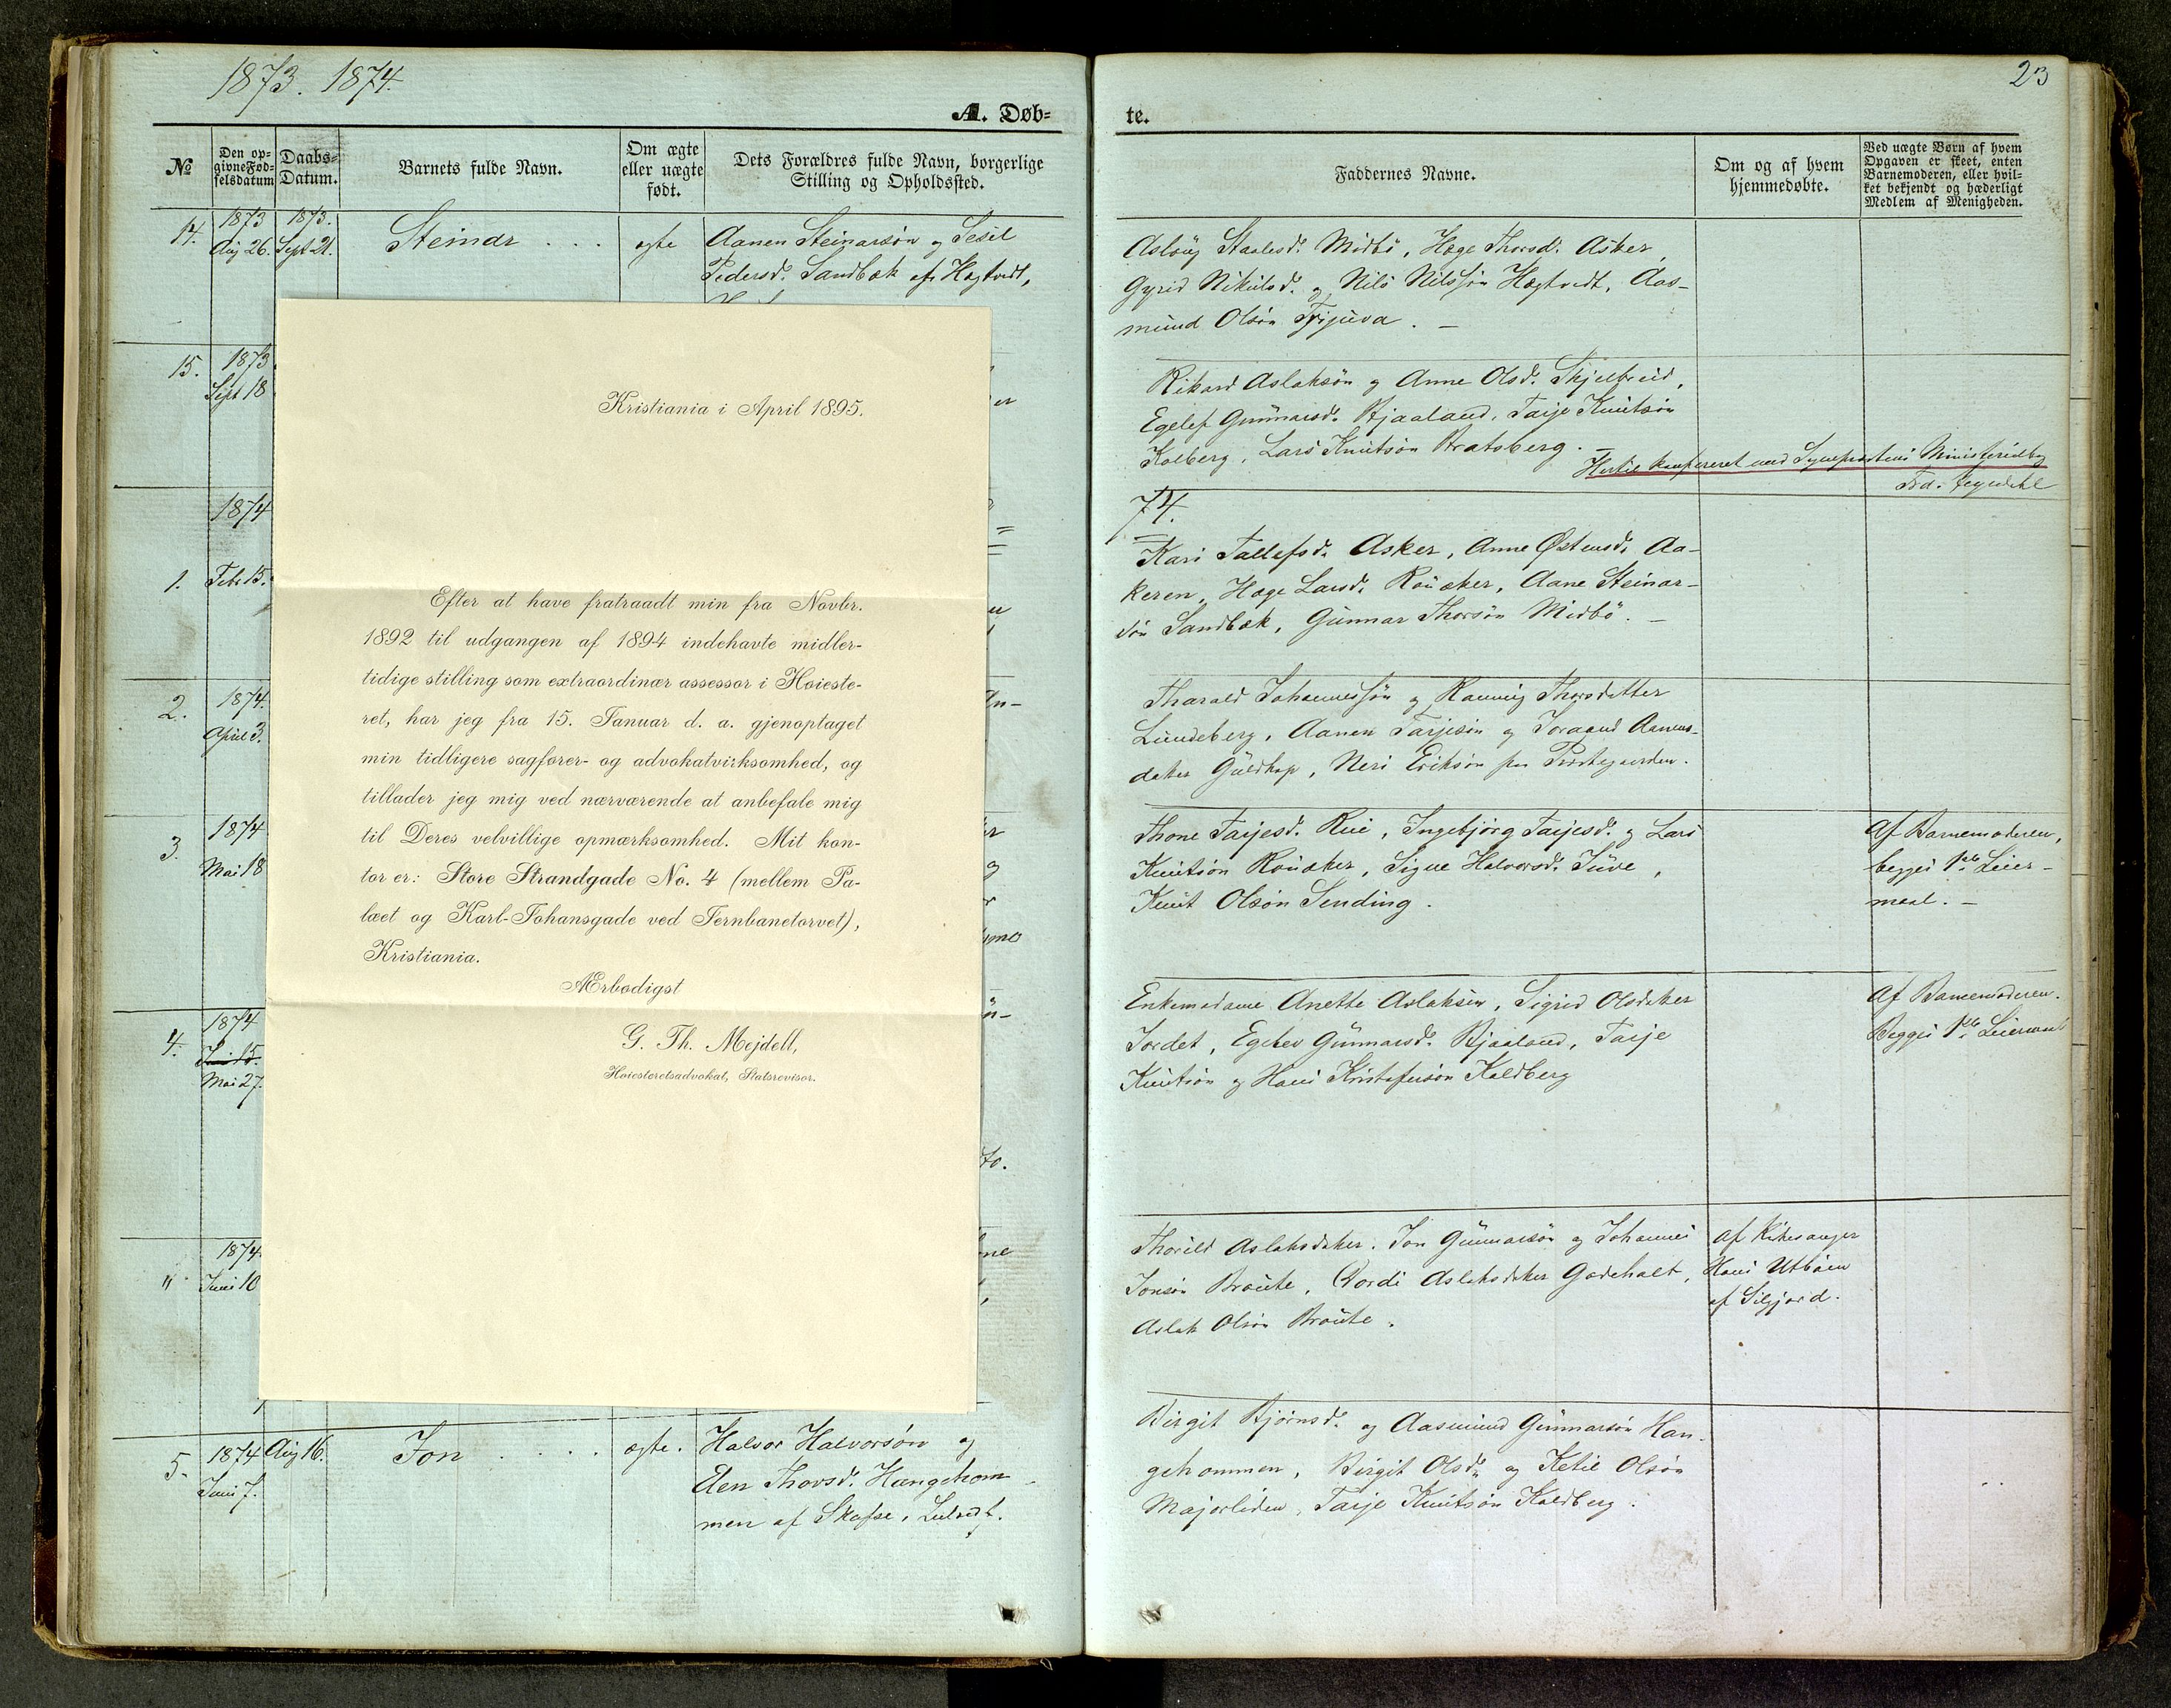 SAKO, Lårdal kirkebøker, G/Ga/L0002: Klokkerbok nr. I 2, 1861-1890, s. 23